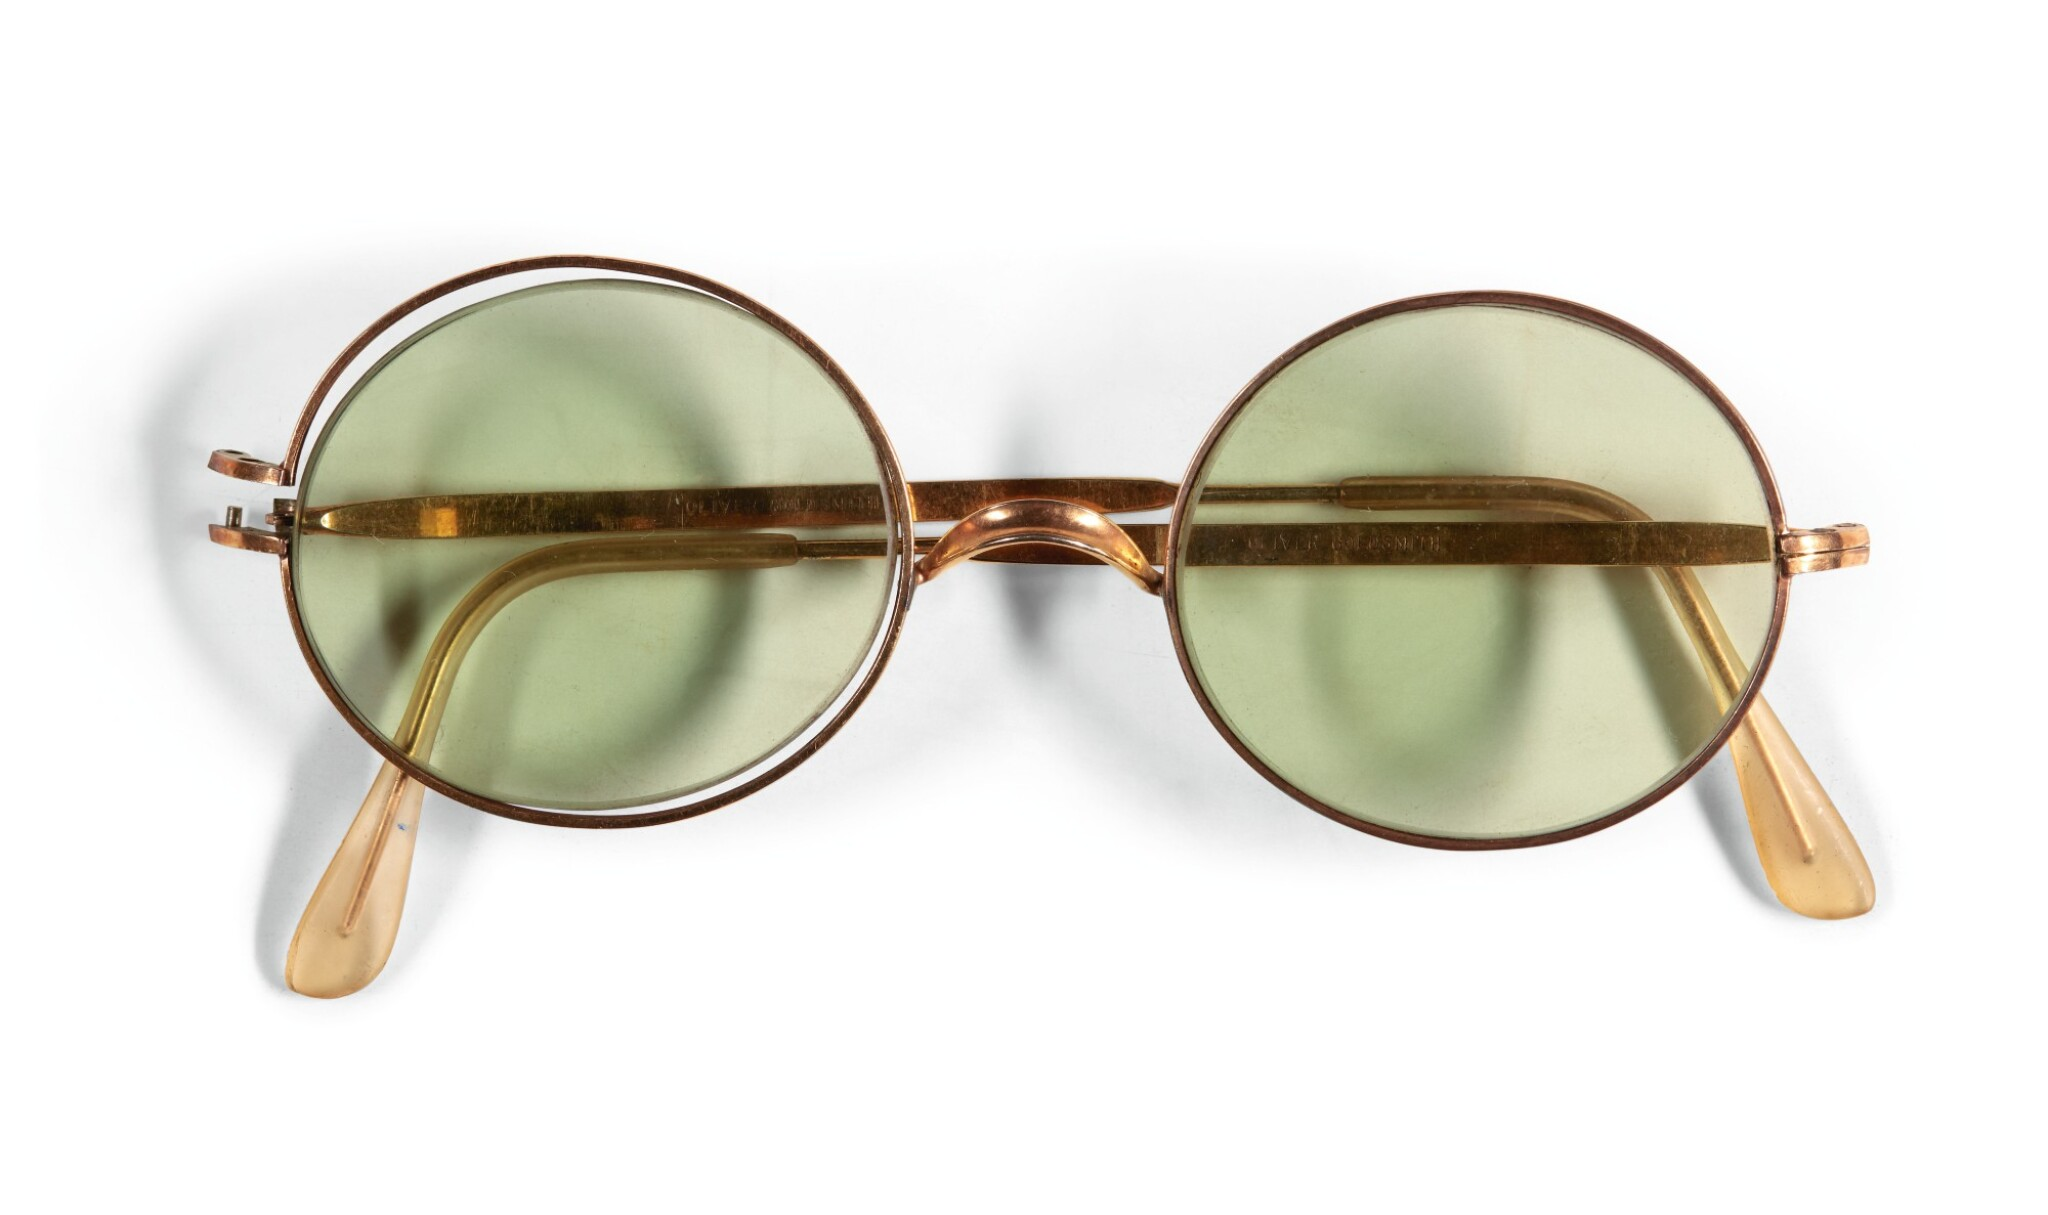 JOHN LENNON   Sunglasses, c. 1968